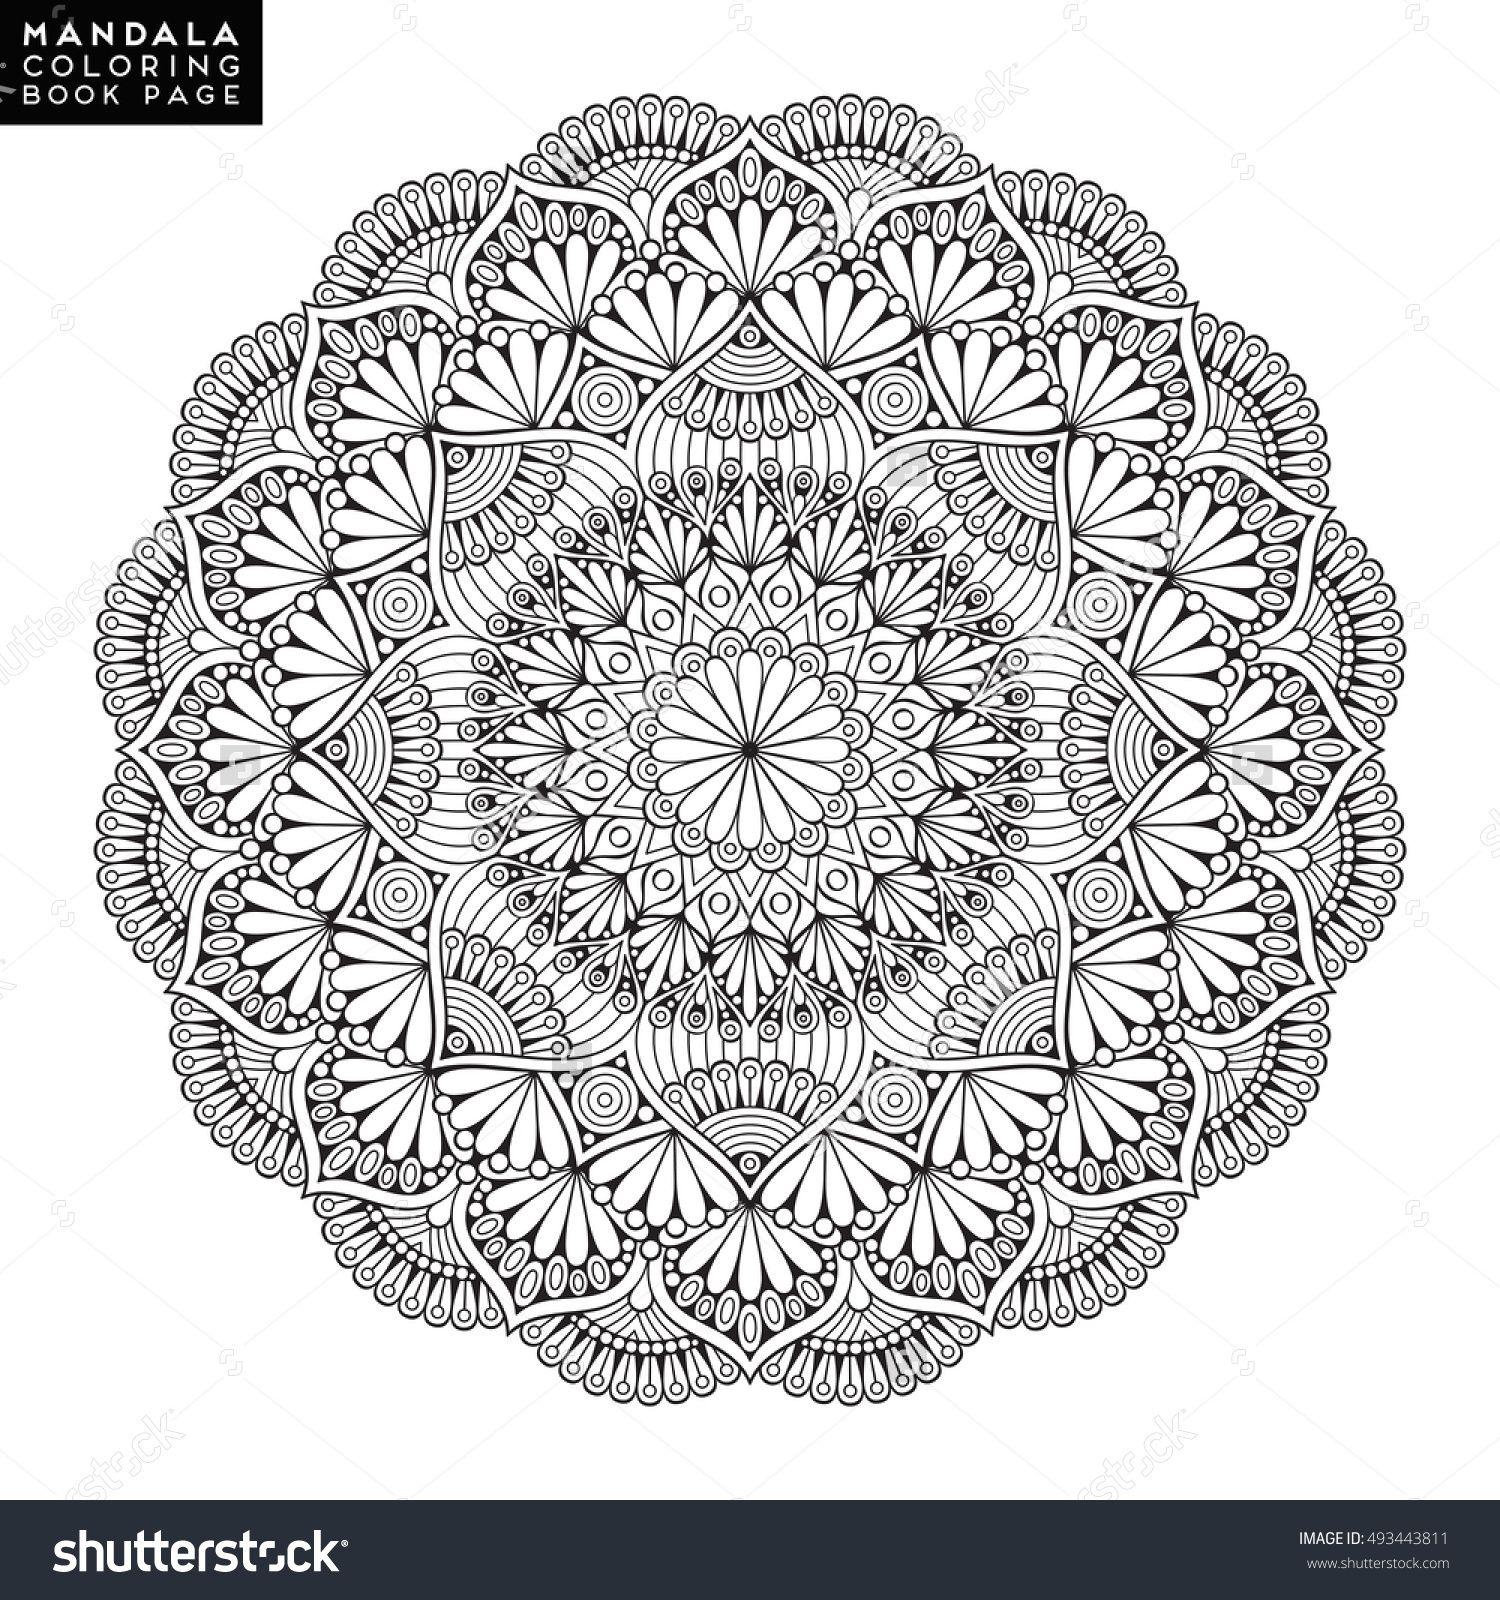 Pin de Neha Sharma en Psychedelic Patterns | Pinterest | Mandalas ...